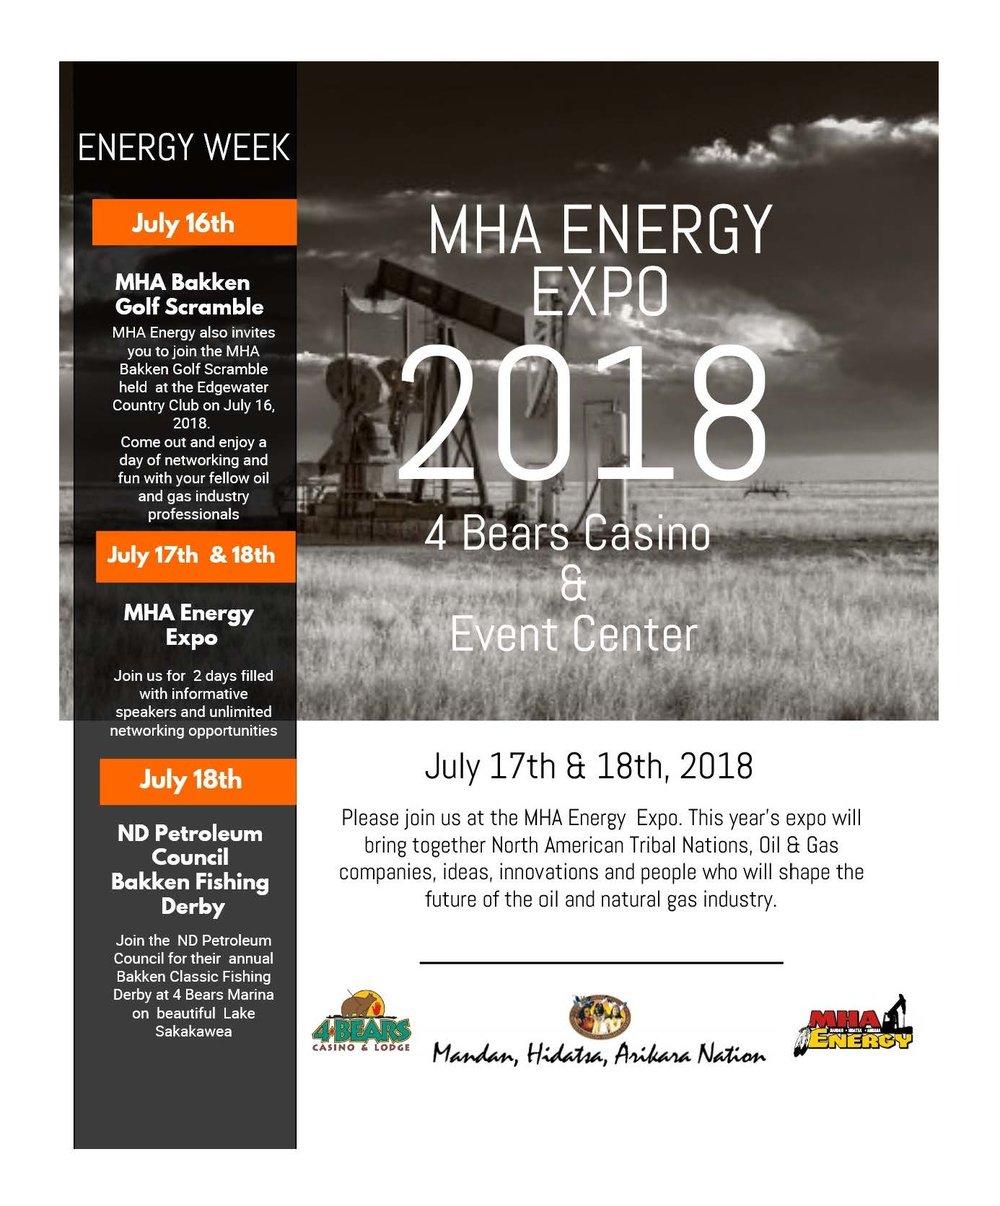 MHA Energy Expo_07-17-18-2018_Page_1.jpg